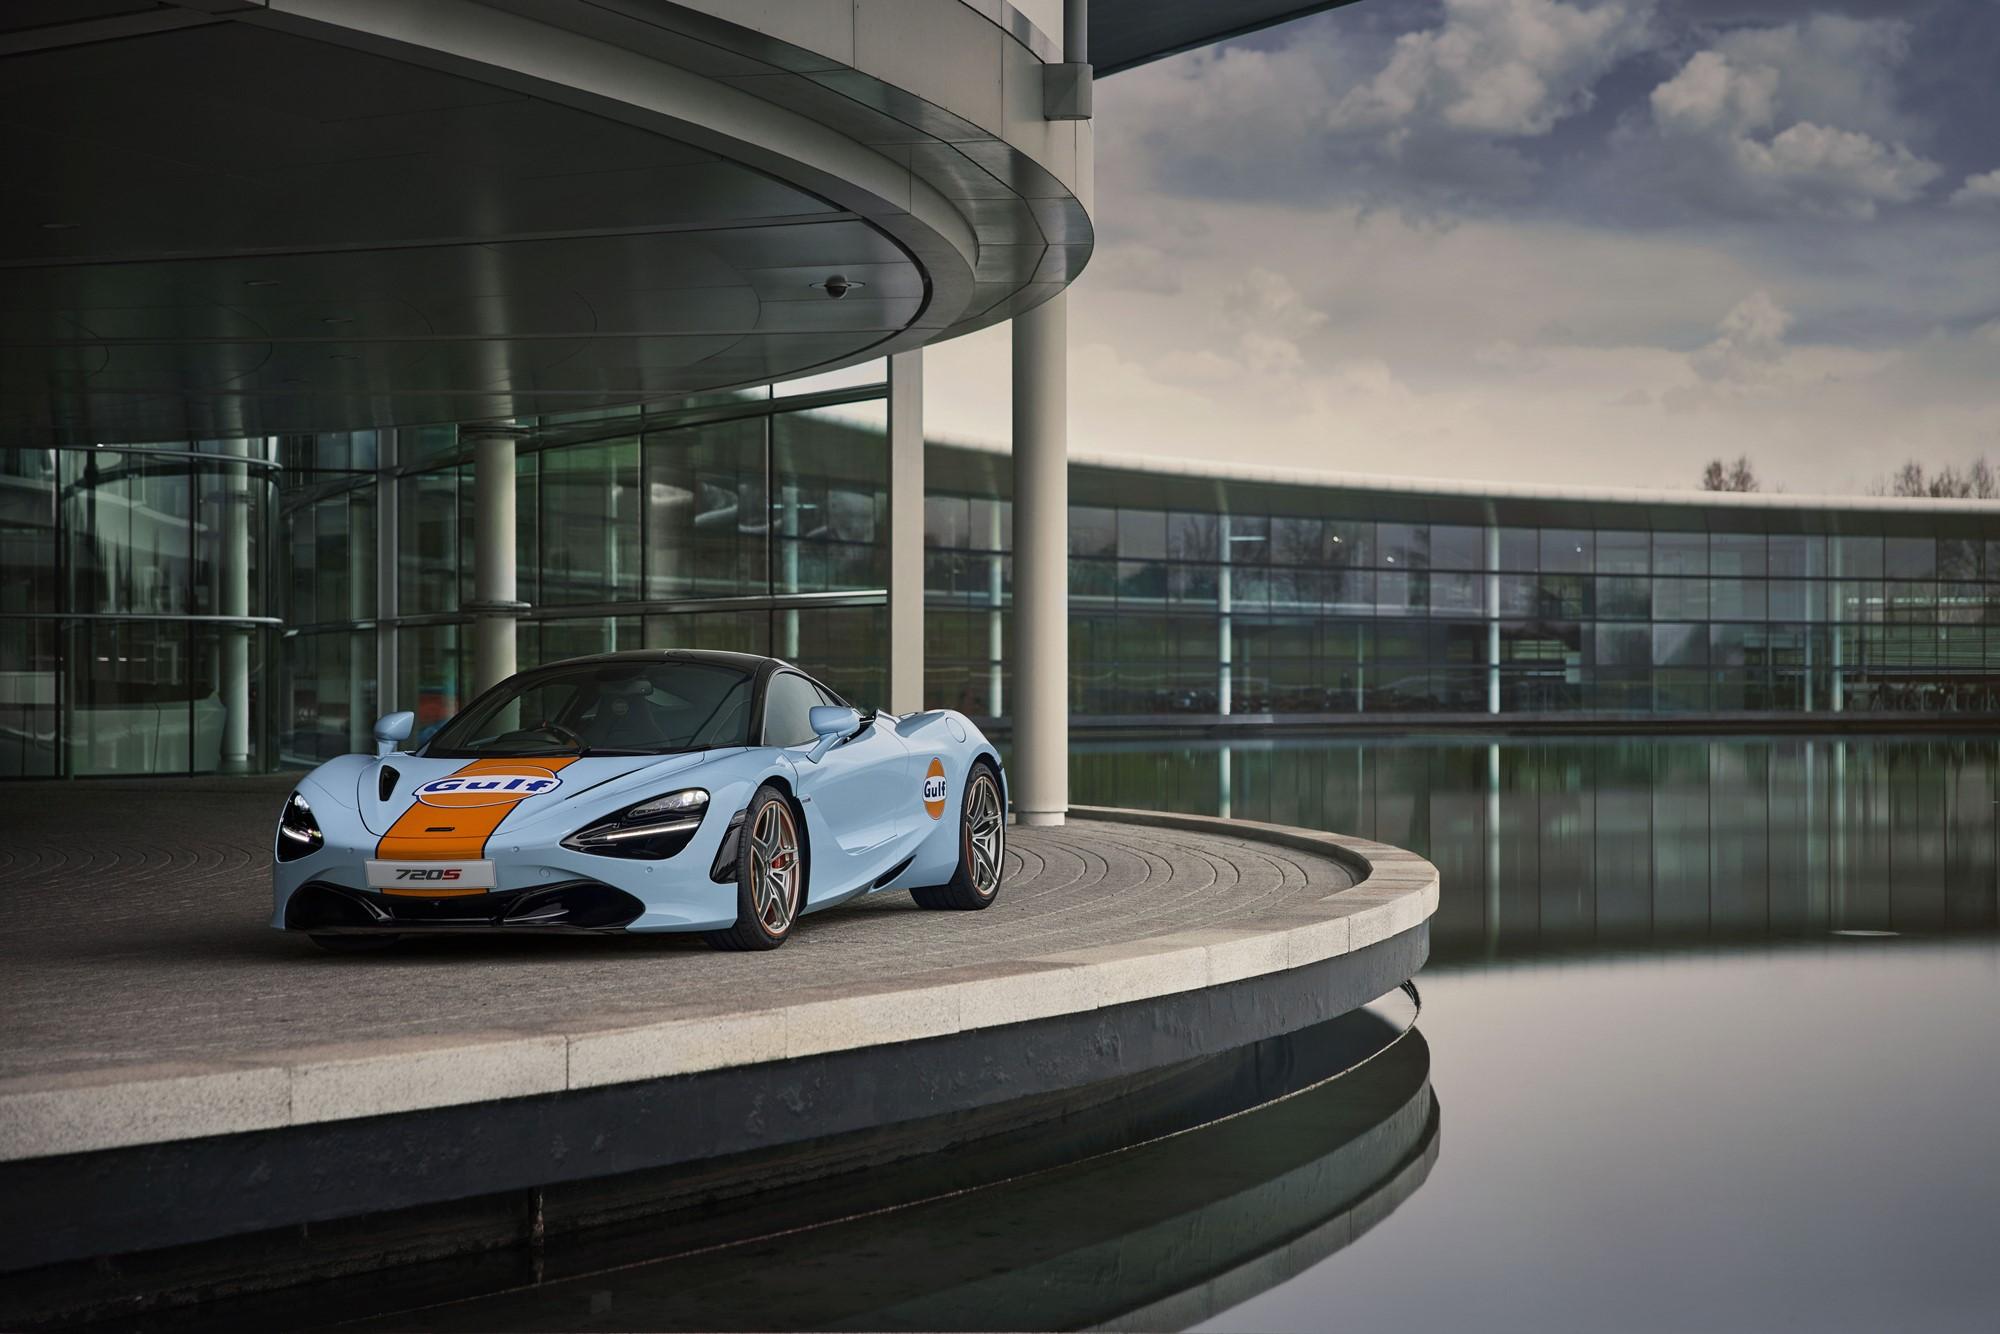 Gulf McLaren 720S photographed at McLaren Technology Centre- Woking UK - March 2021 Ref: Gulf_McLaren_720S-001.TIF